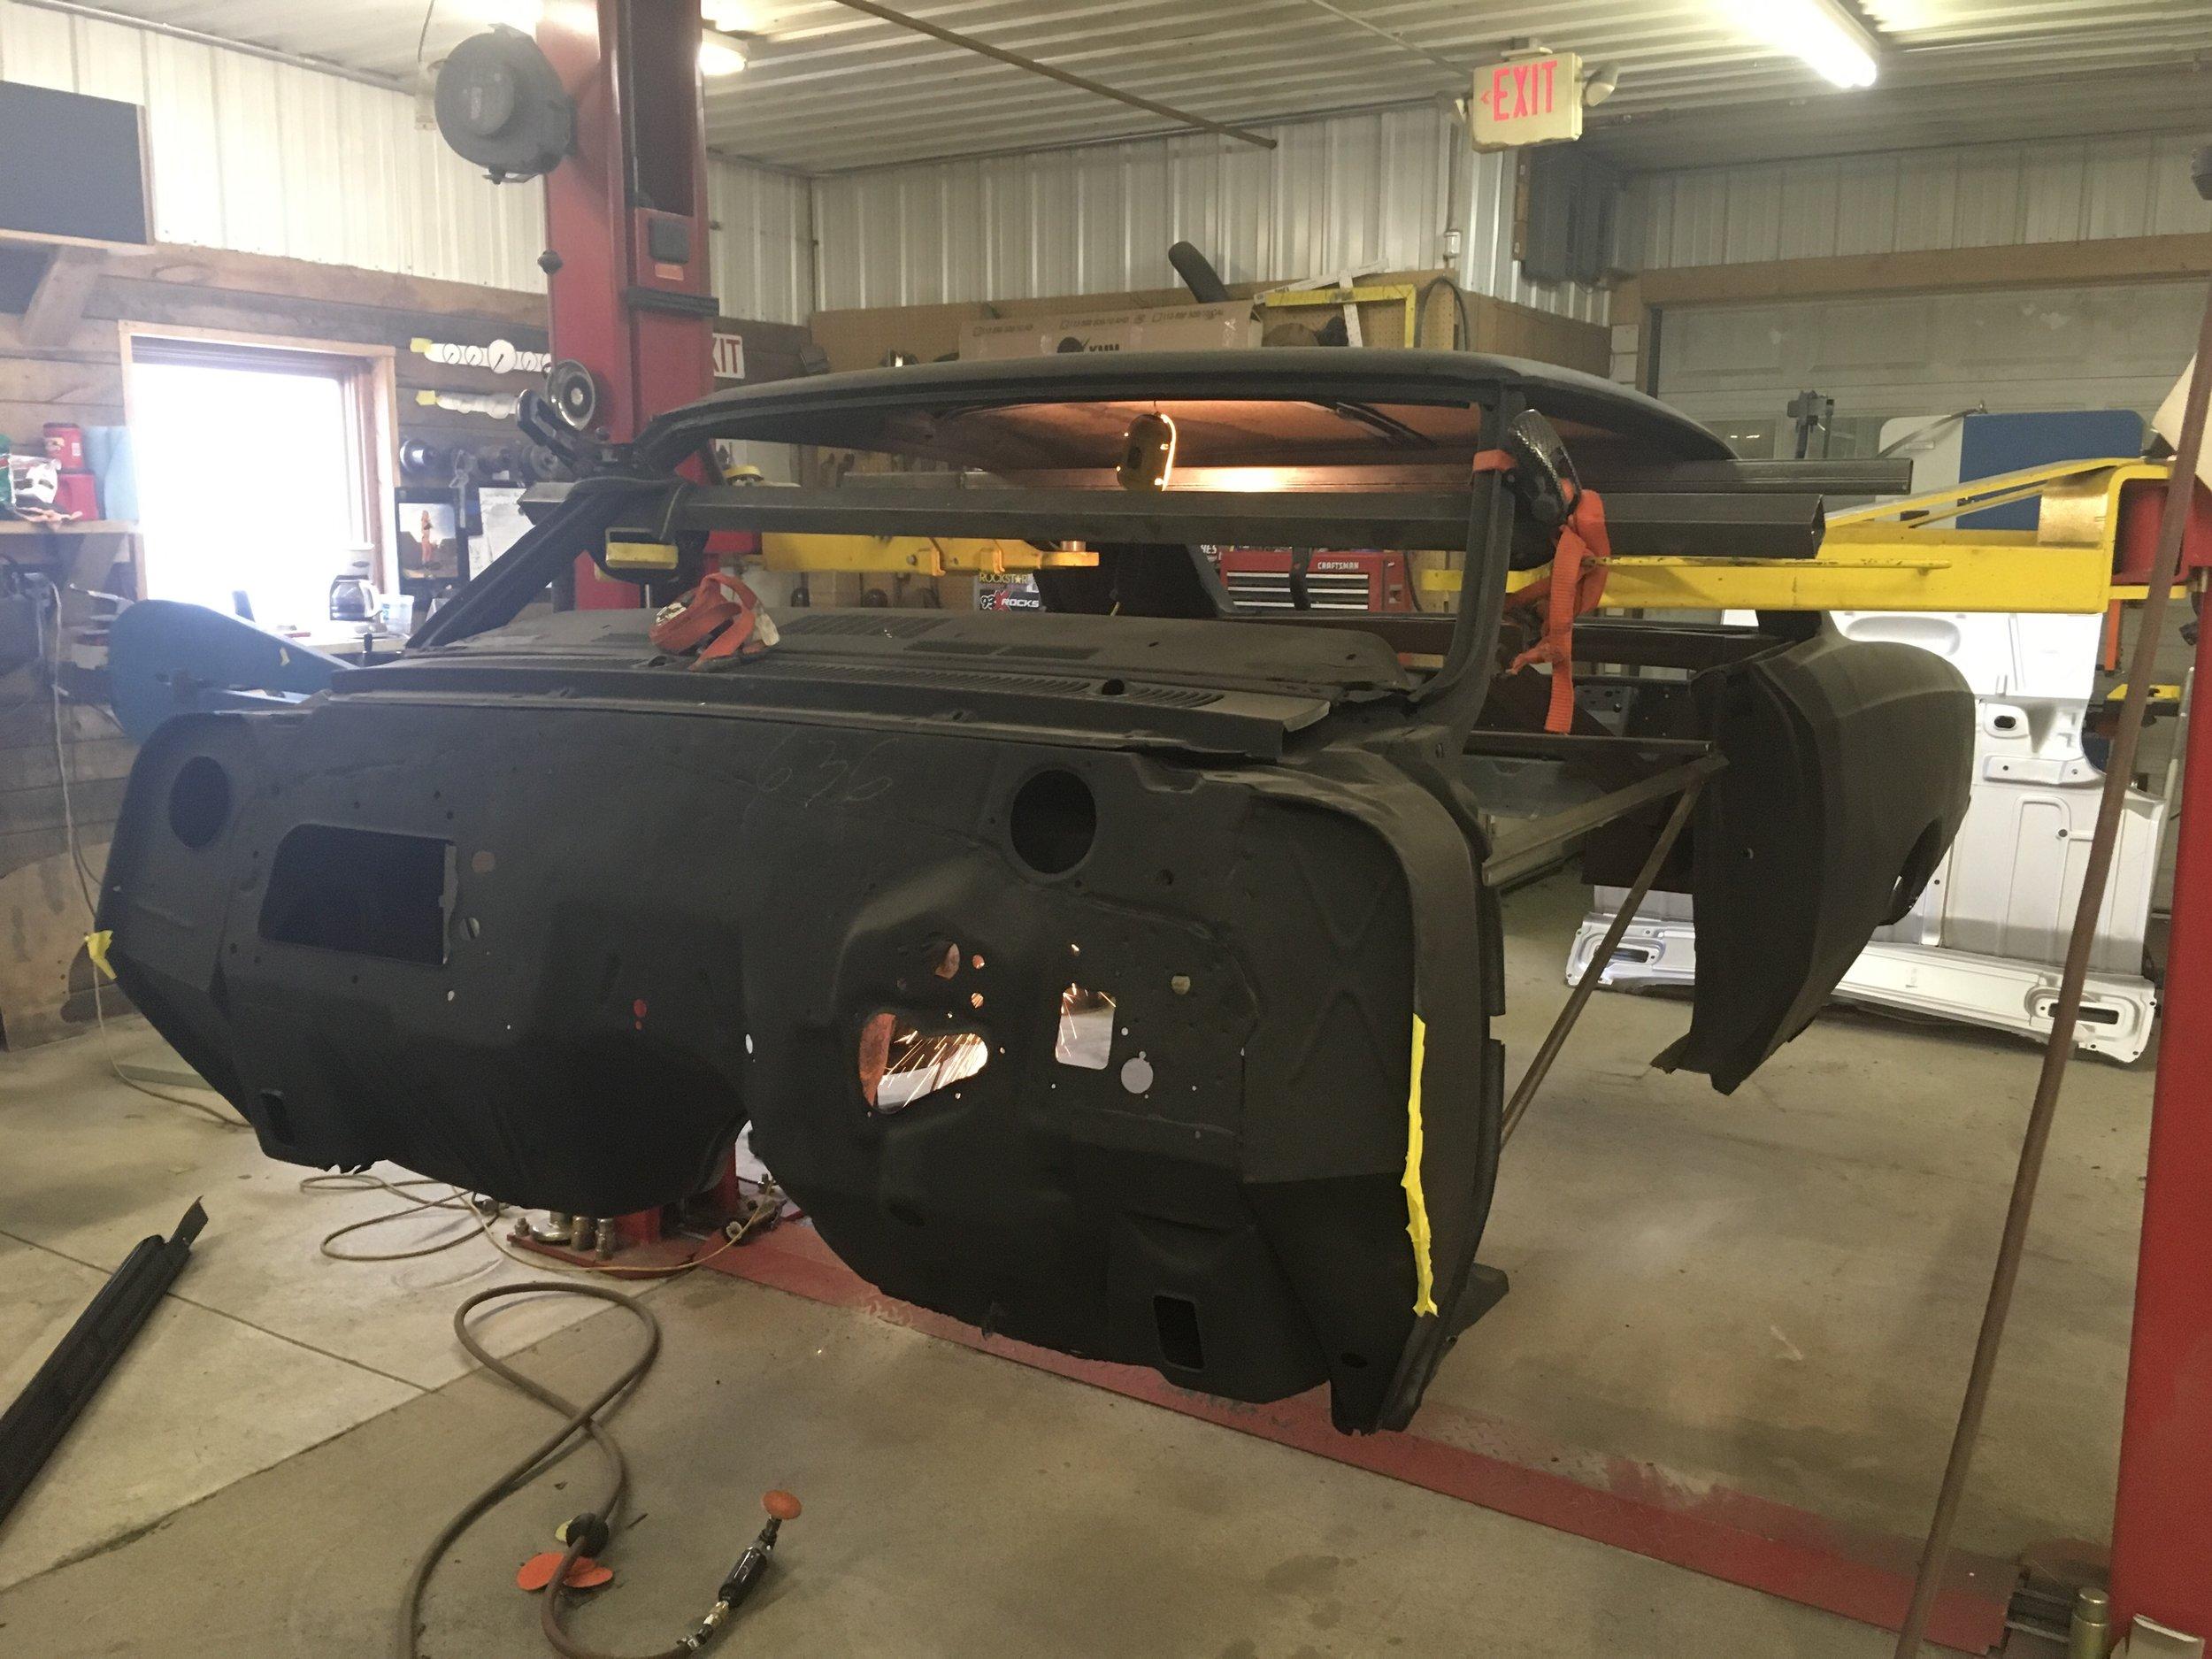 66-chevelle-frame-and-body-work-minnesota-hot-rod-factory-car-restoration.jpg